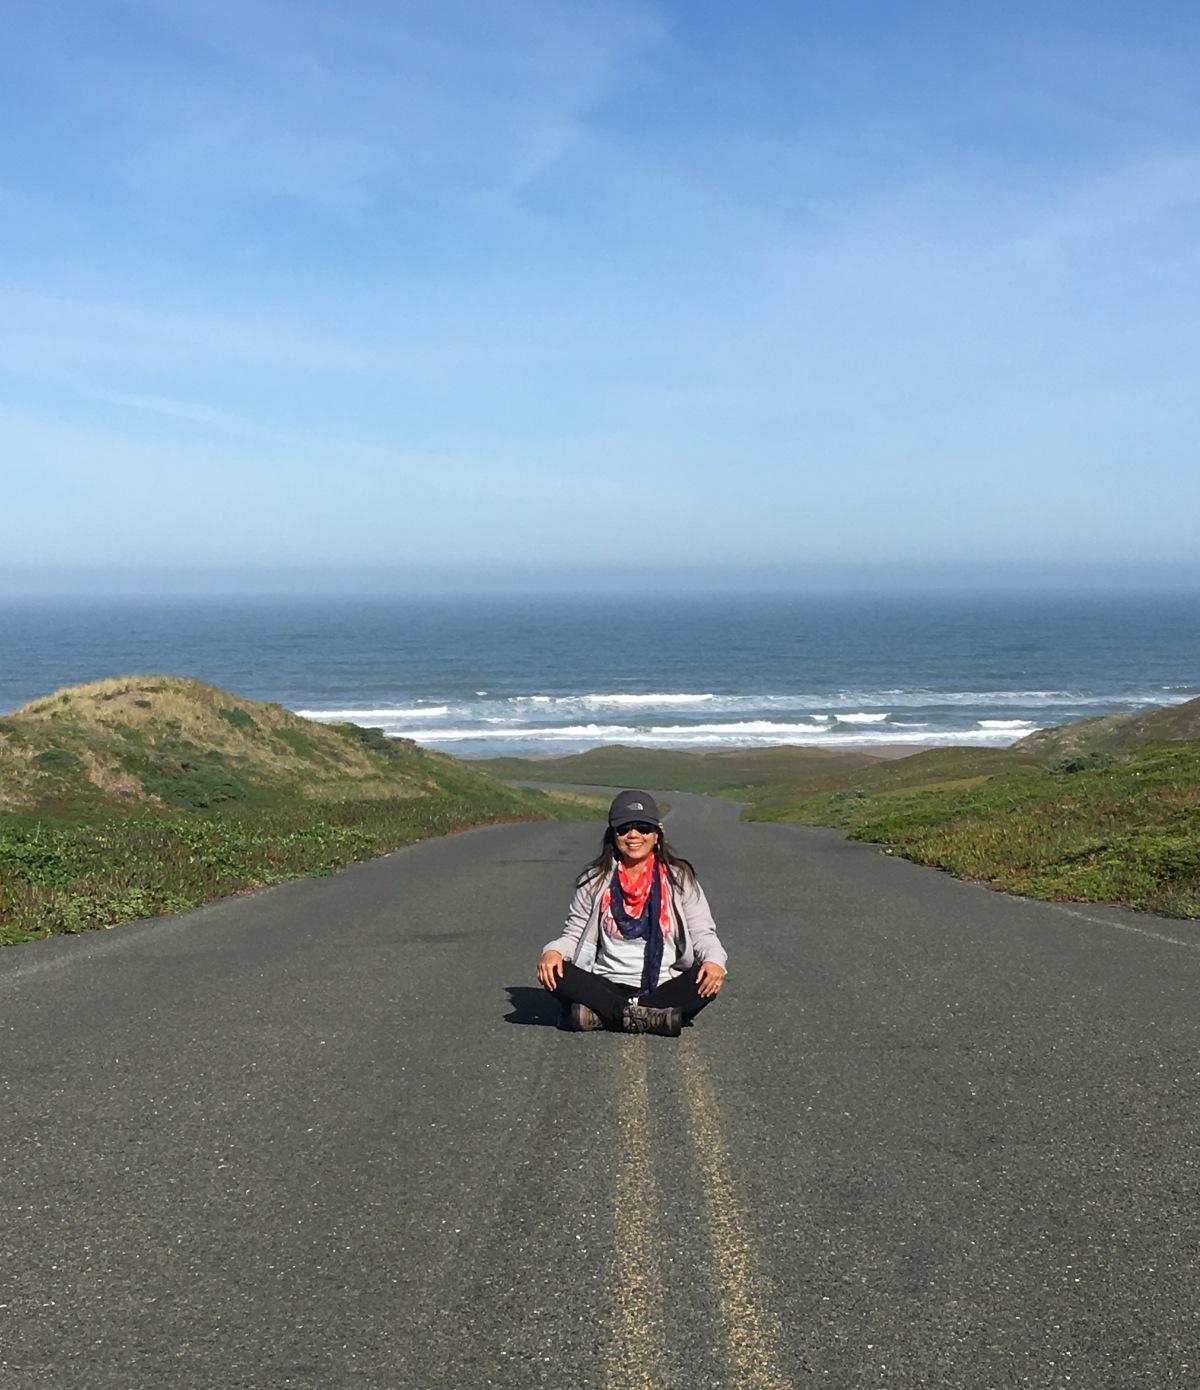 San Francisco day trip: The historic Point Reyes National Seashore